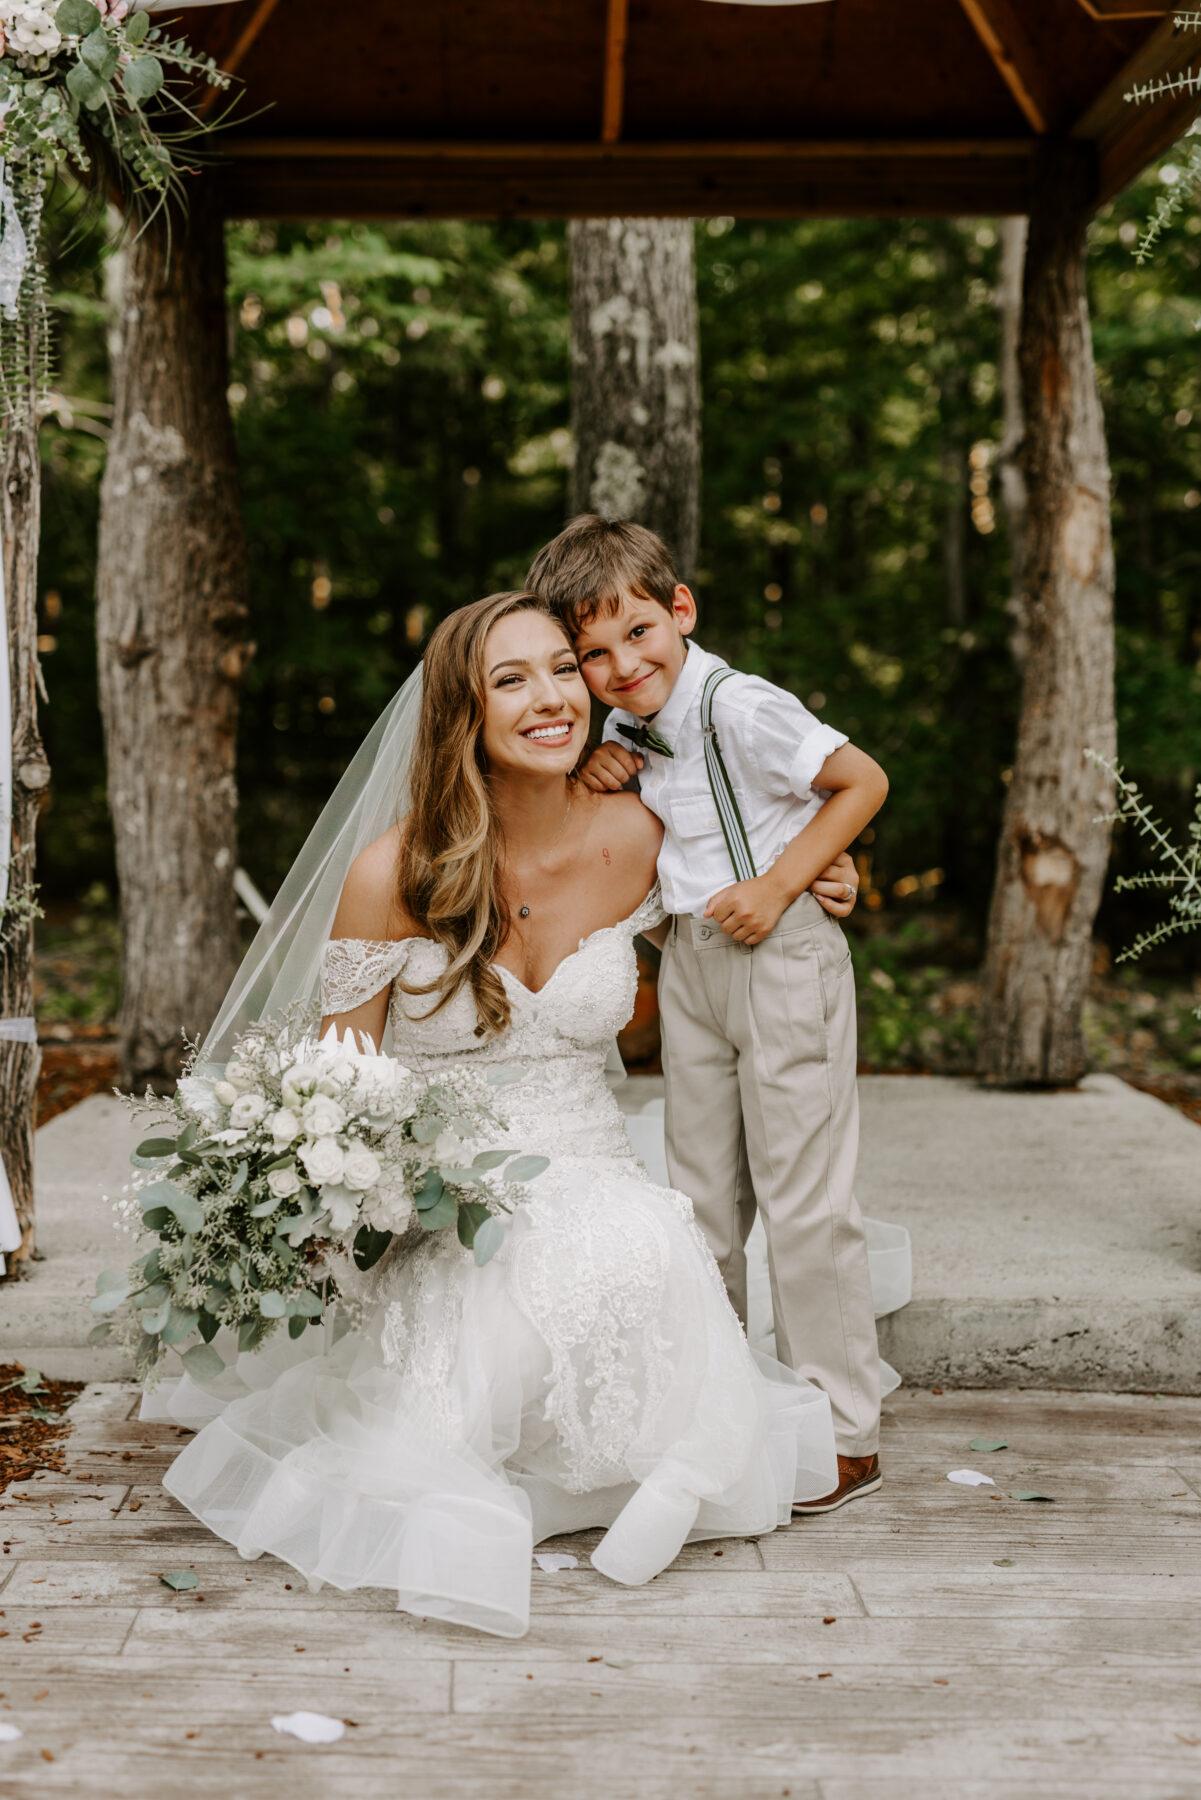 Five Bridge Inn Rehoboth Wedding Katie and Enrique Blueflash Photography 14